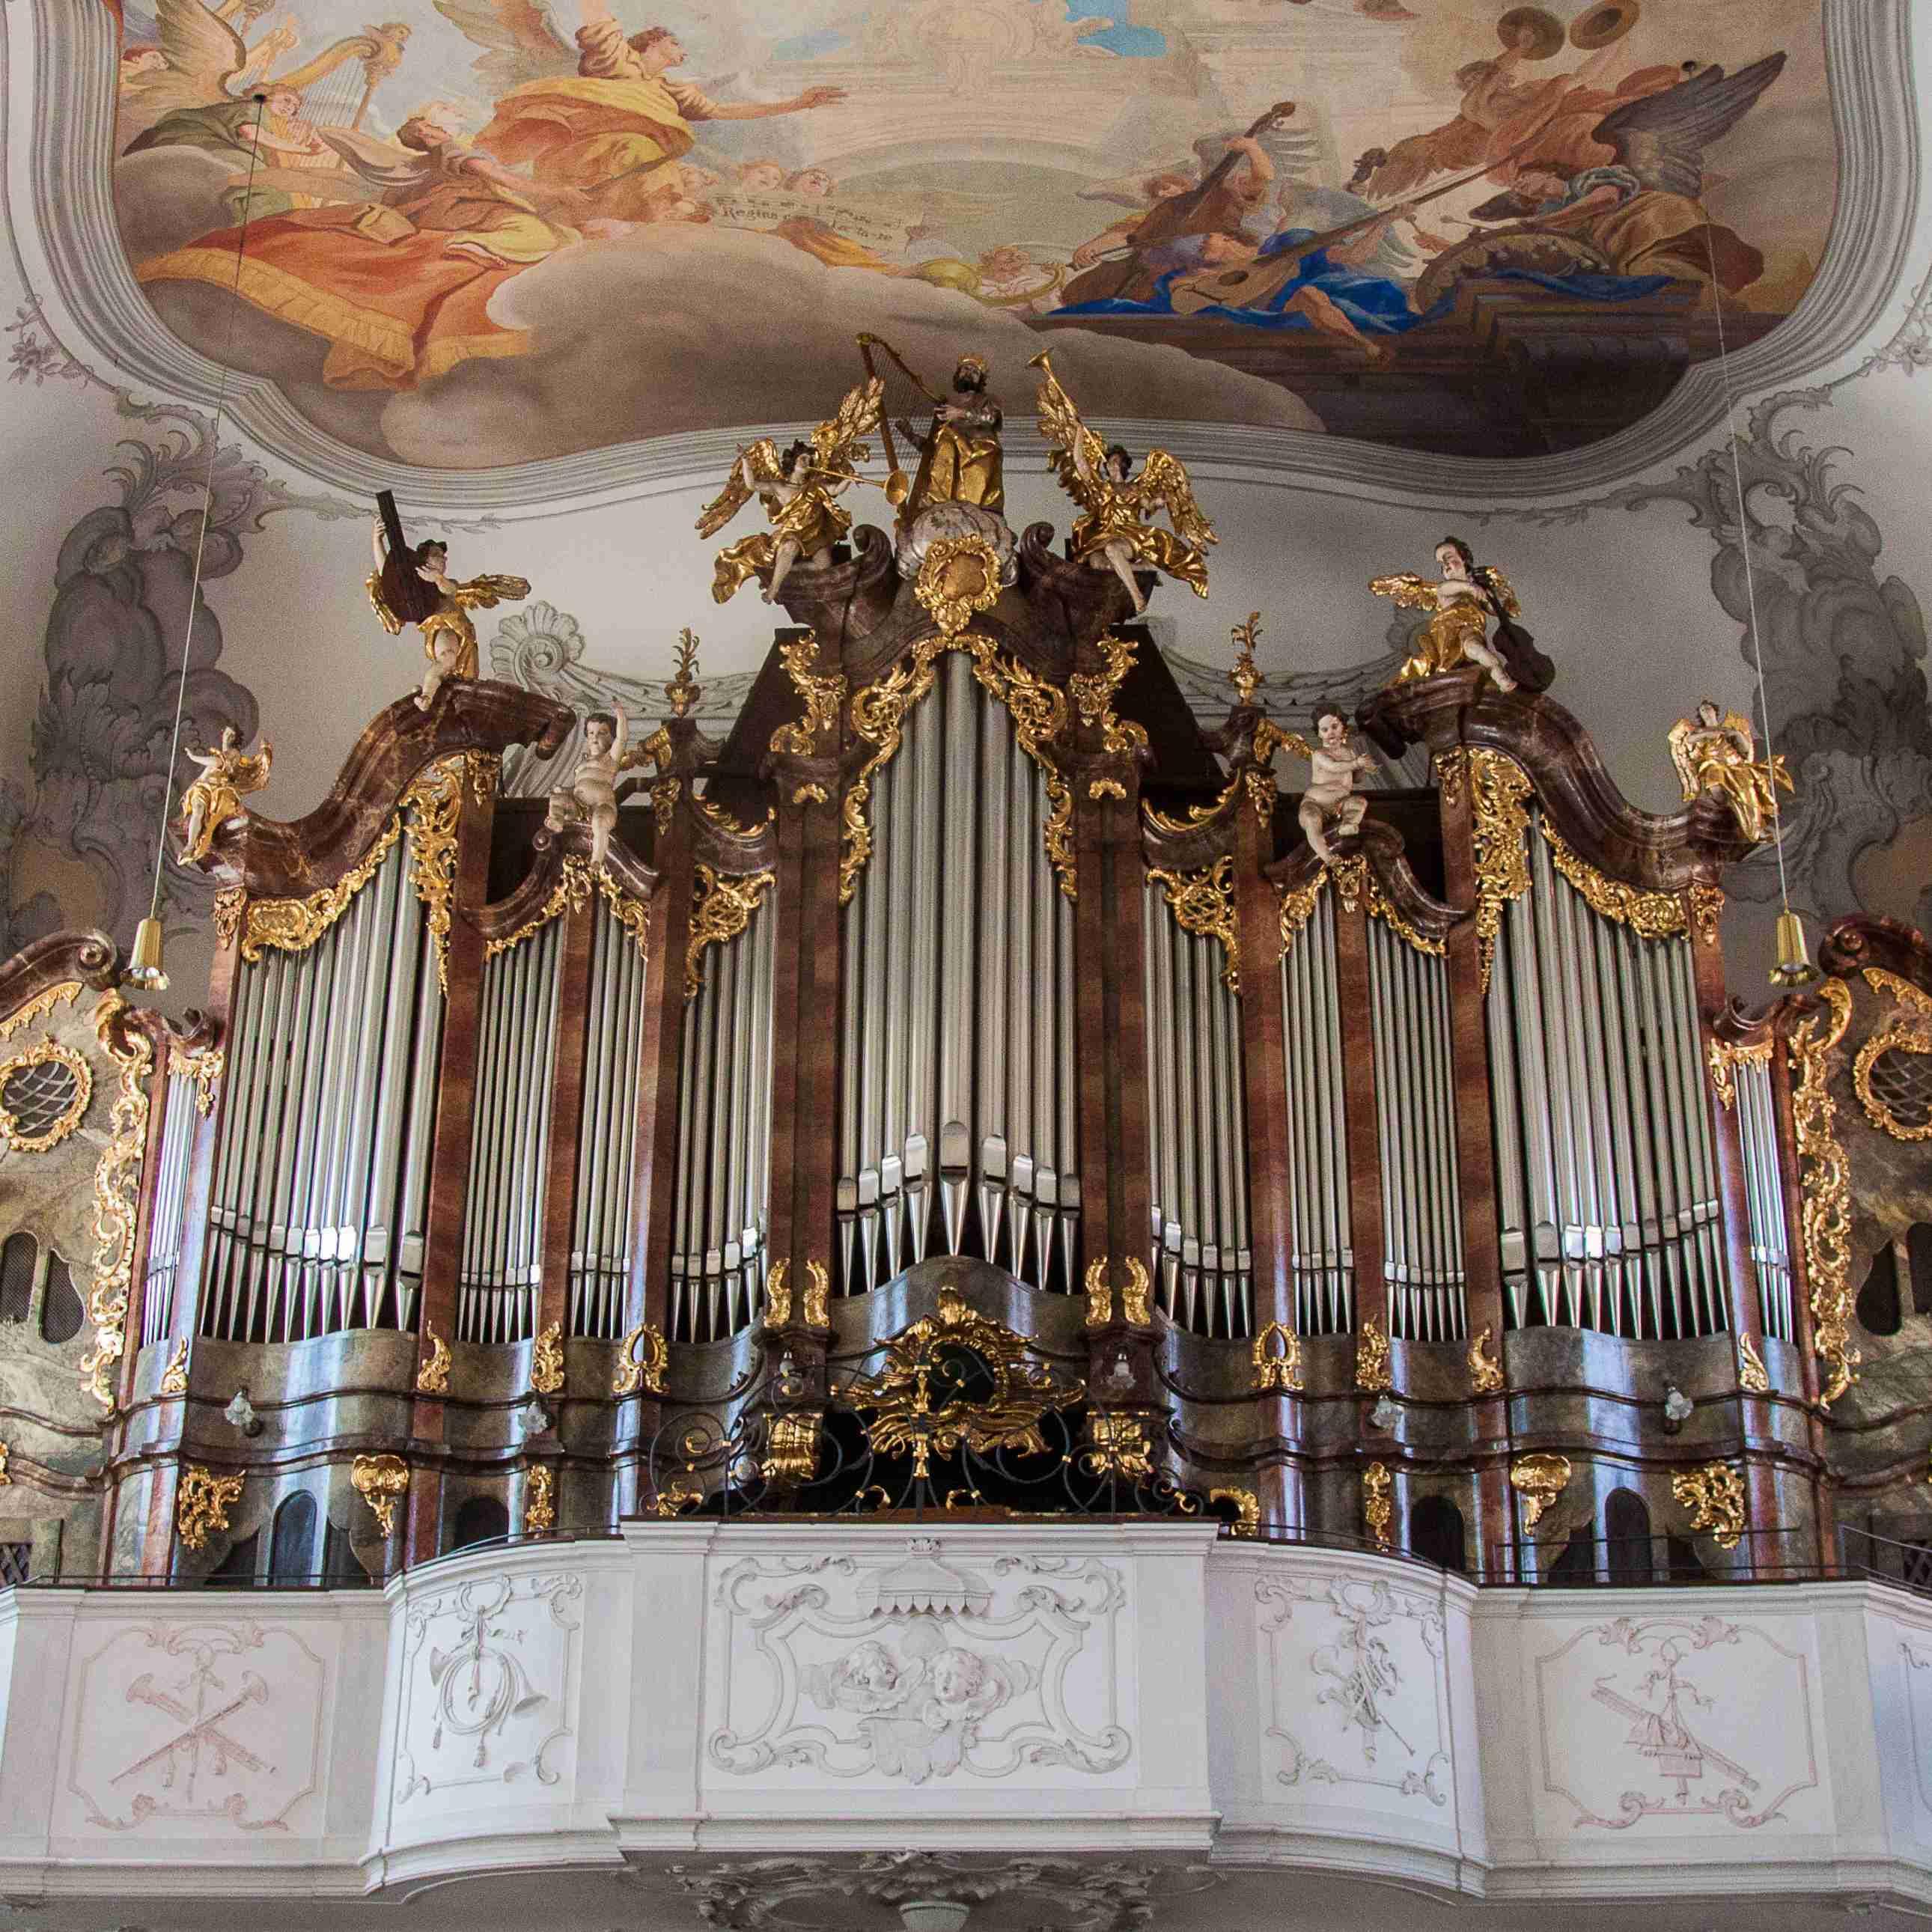 Концерт «Ave Maria. Шуберт, Бах, Сен-Санс, Масканьи. Голос и орган» со скидкой 50%